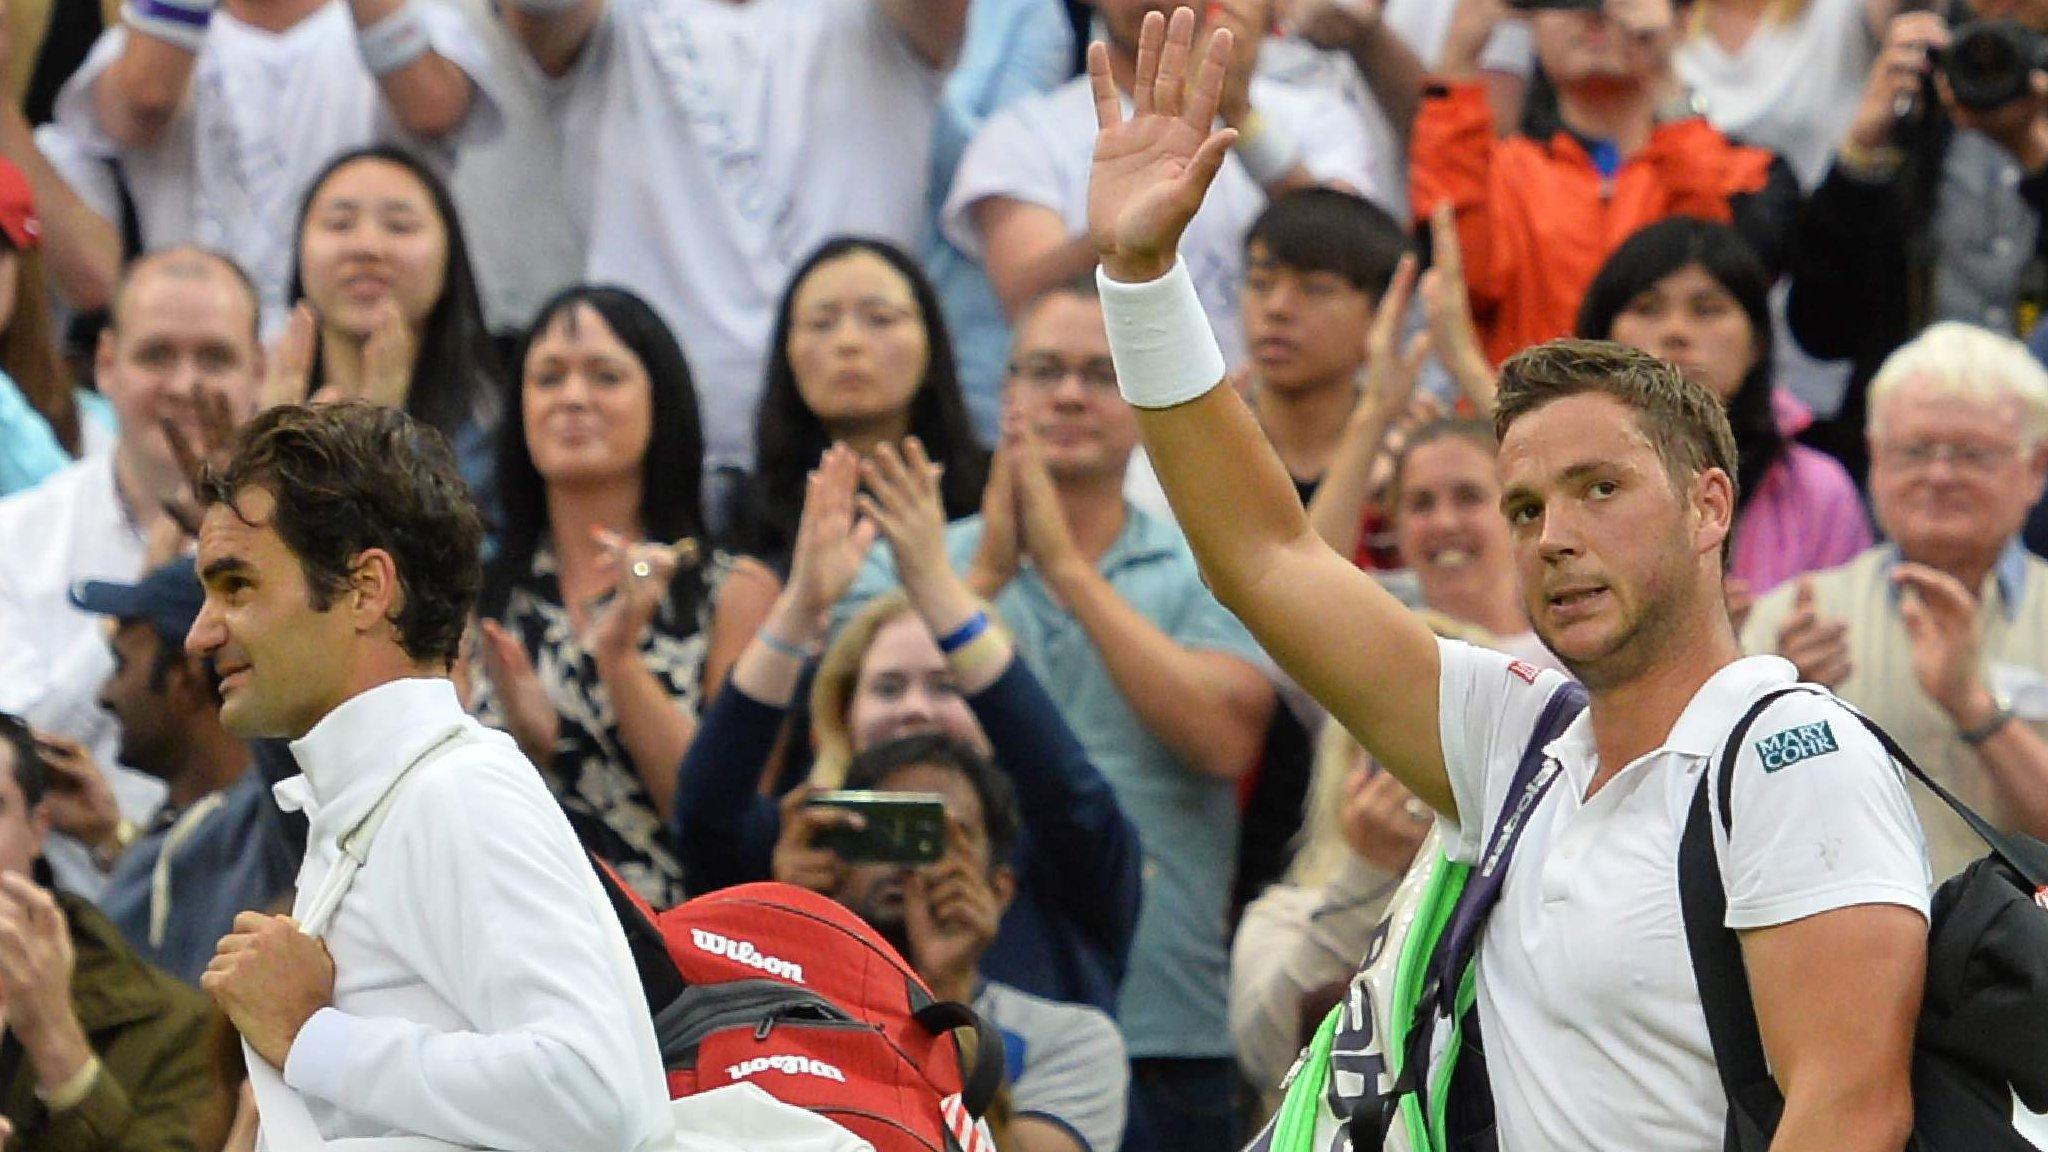 Wimbledon 2016: Roger Federer beats British qualifier Marcus Willis